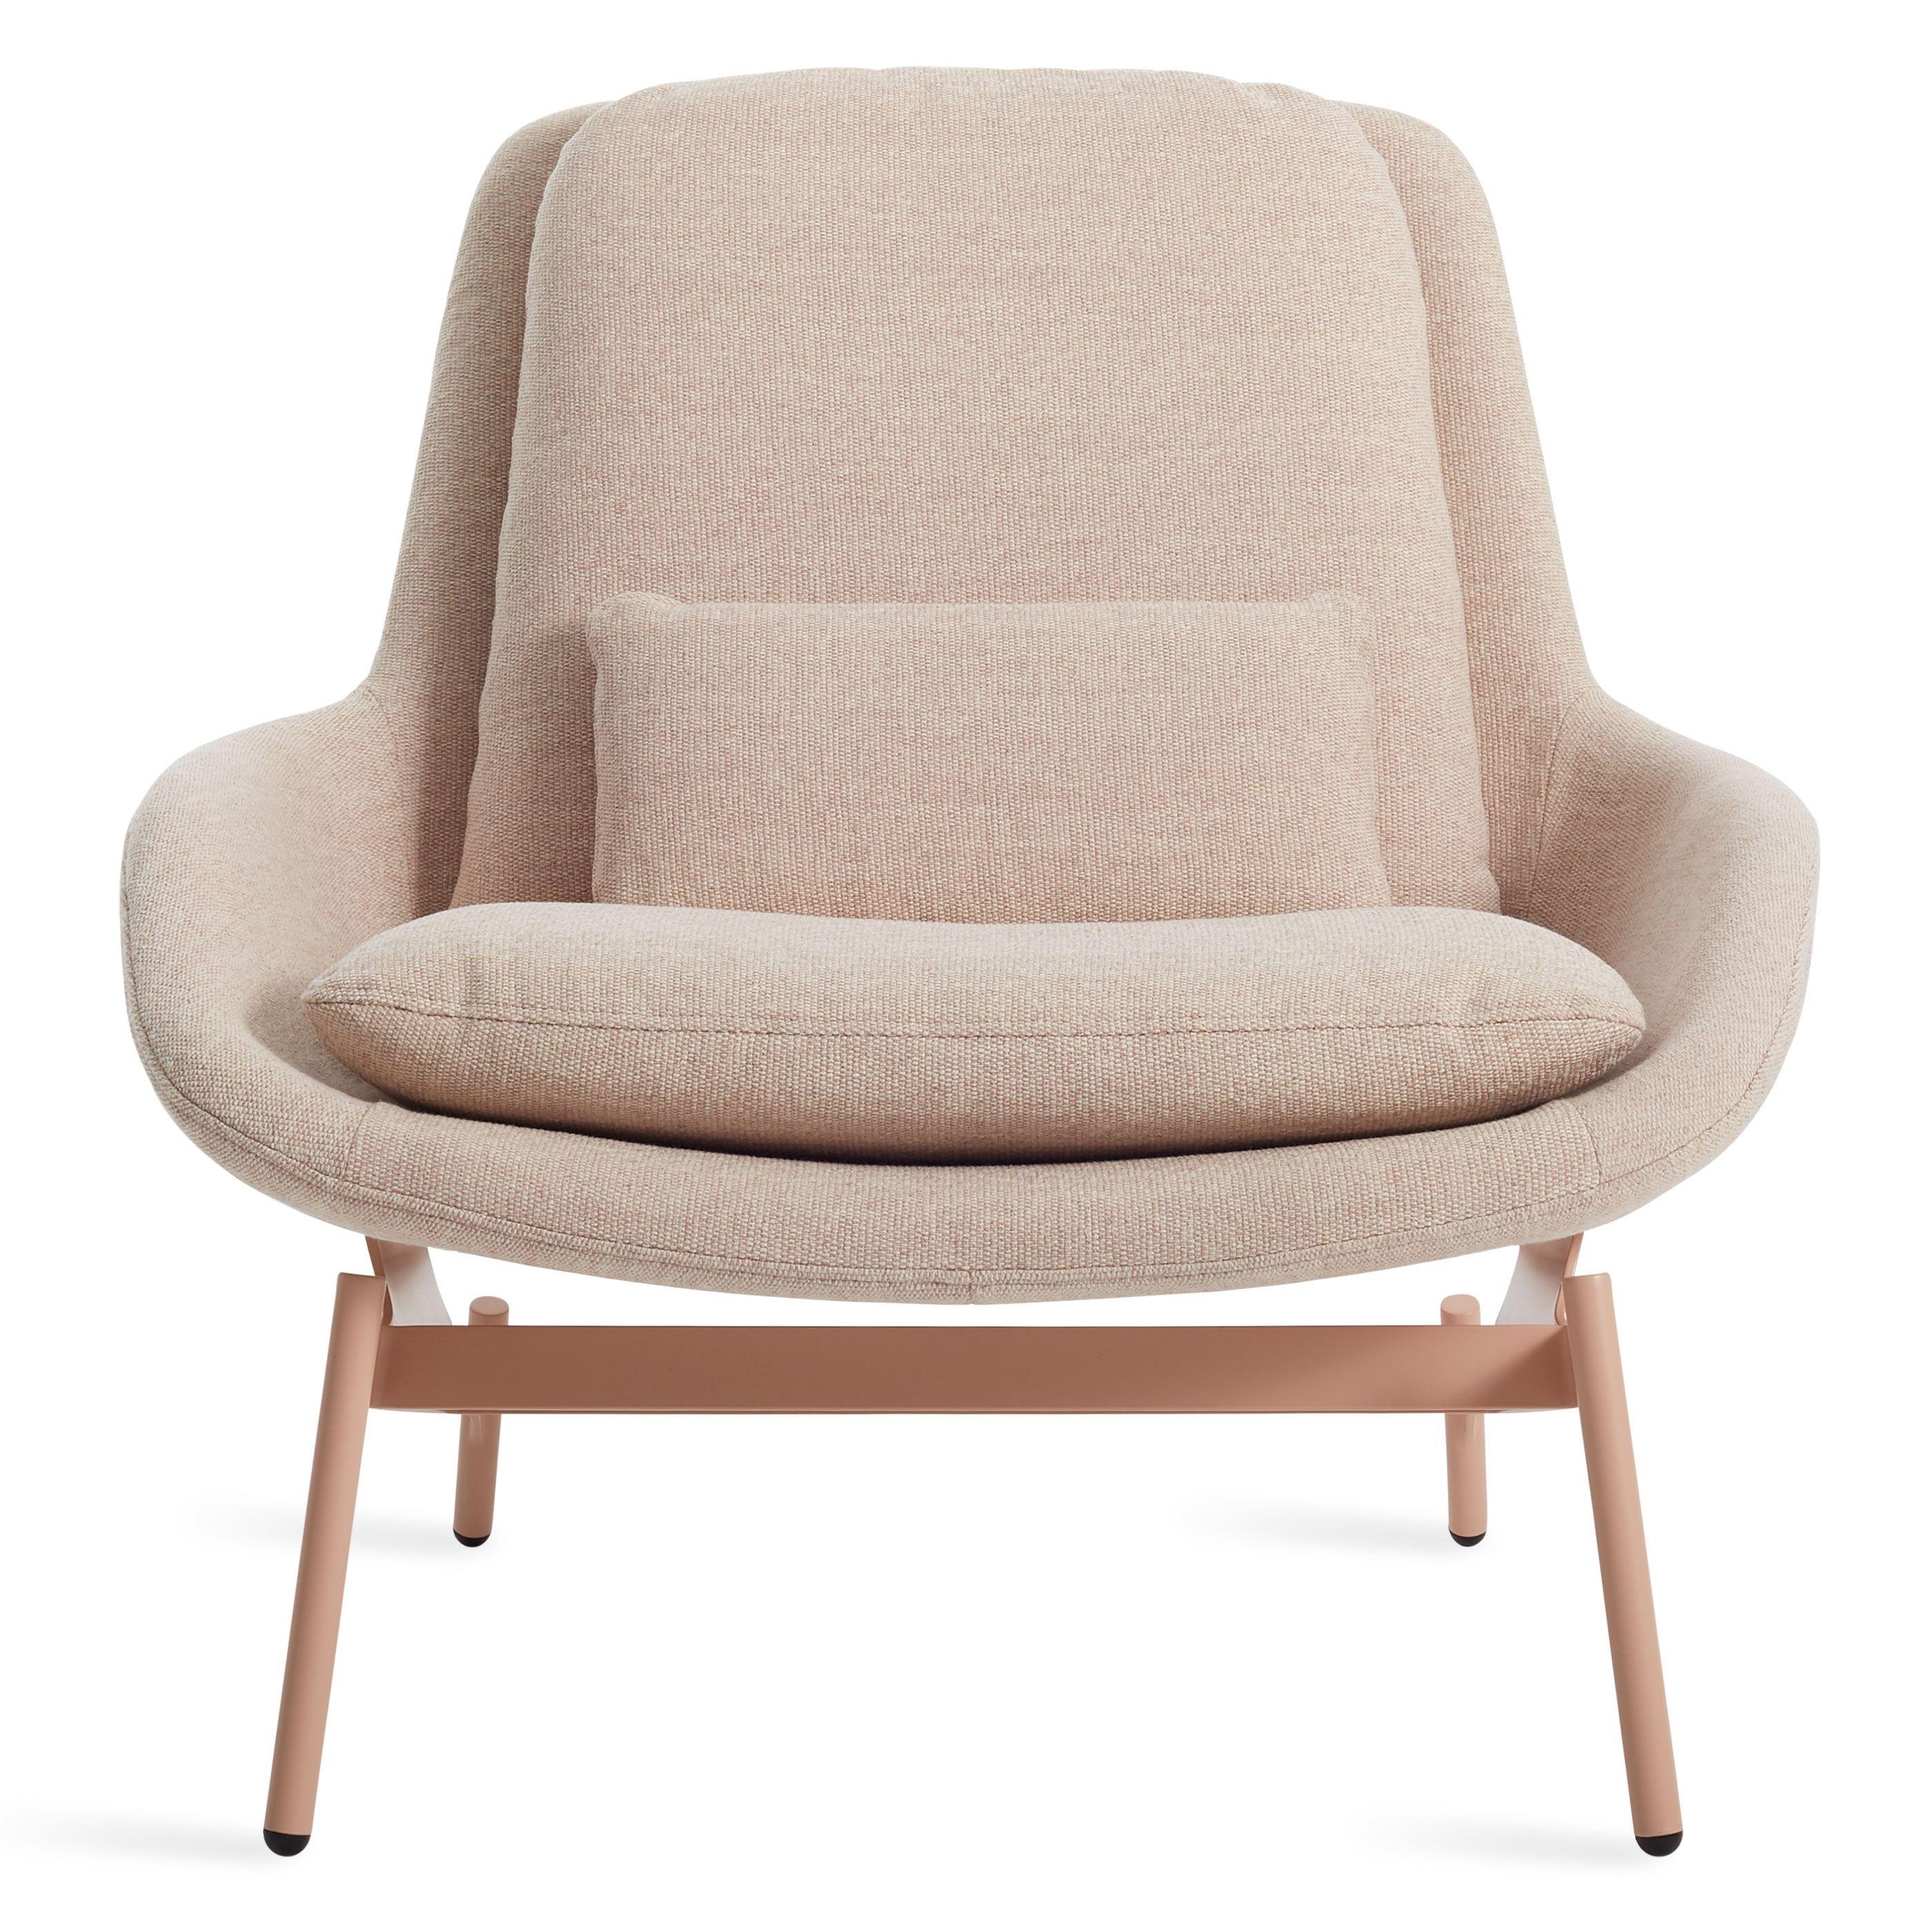 Super Field Lounge Chair Tait Blush Condo Lounge Chair Design Inzonedesignstudio Interior Chair Design Inzonedesignstudiocom